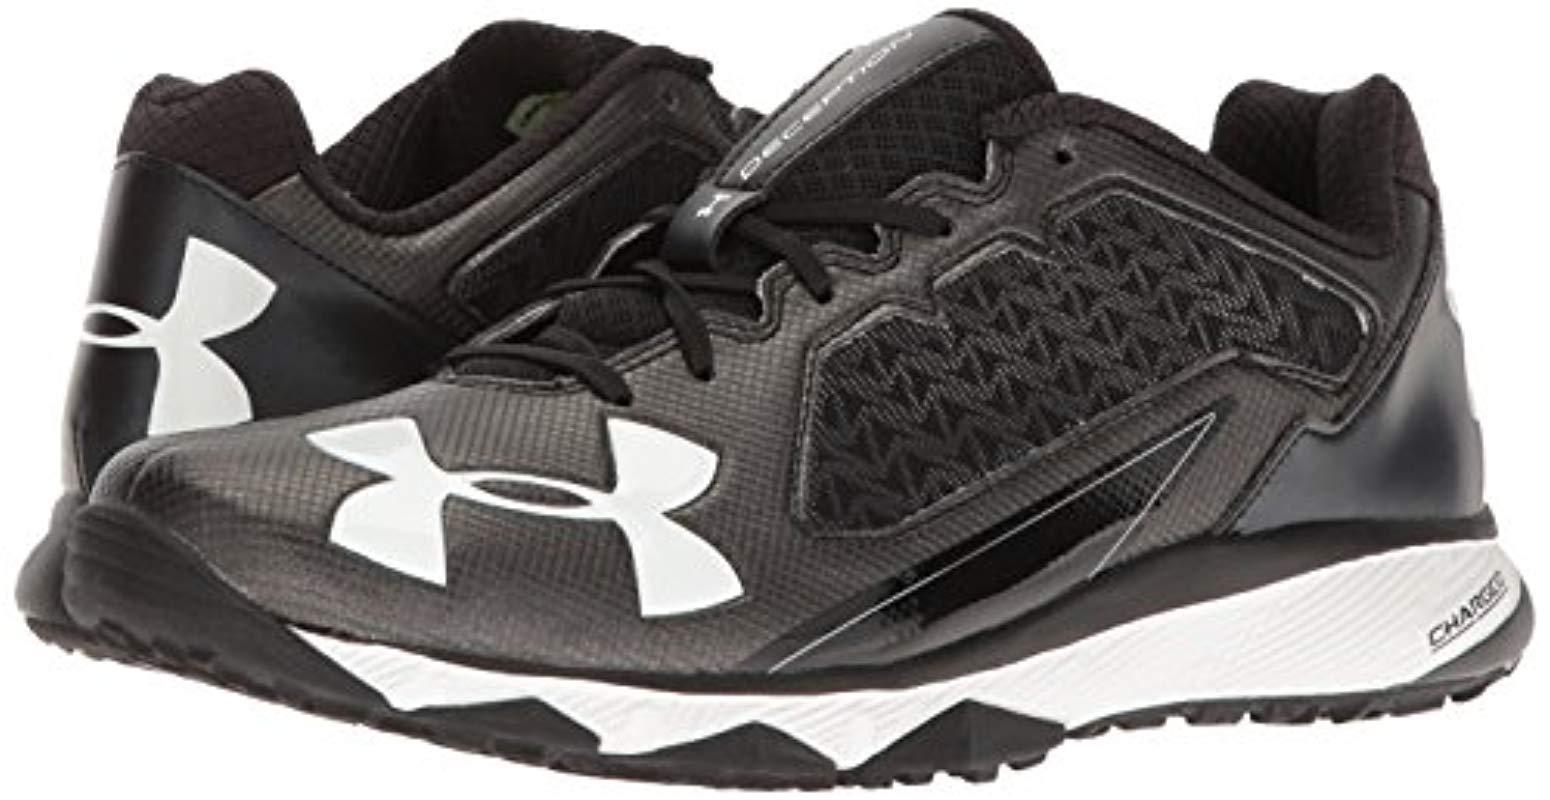 Deception Trainer Baseball Shoe